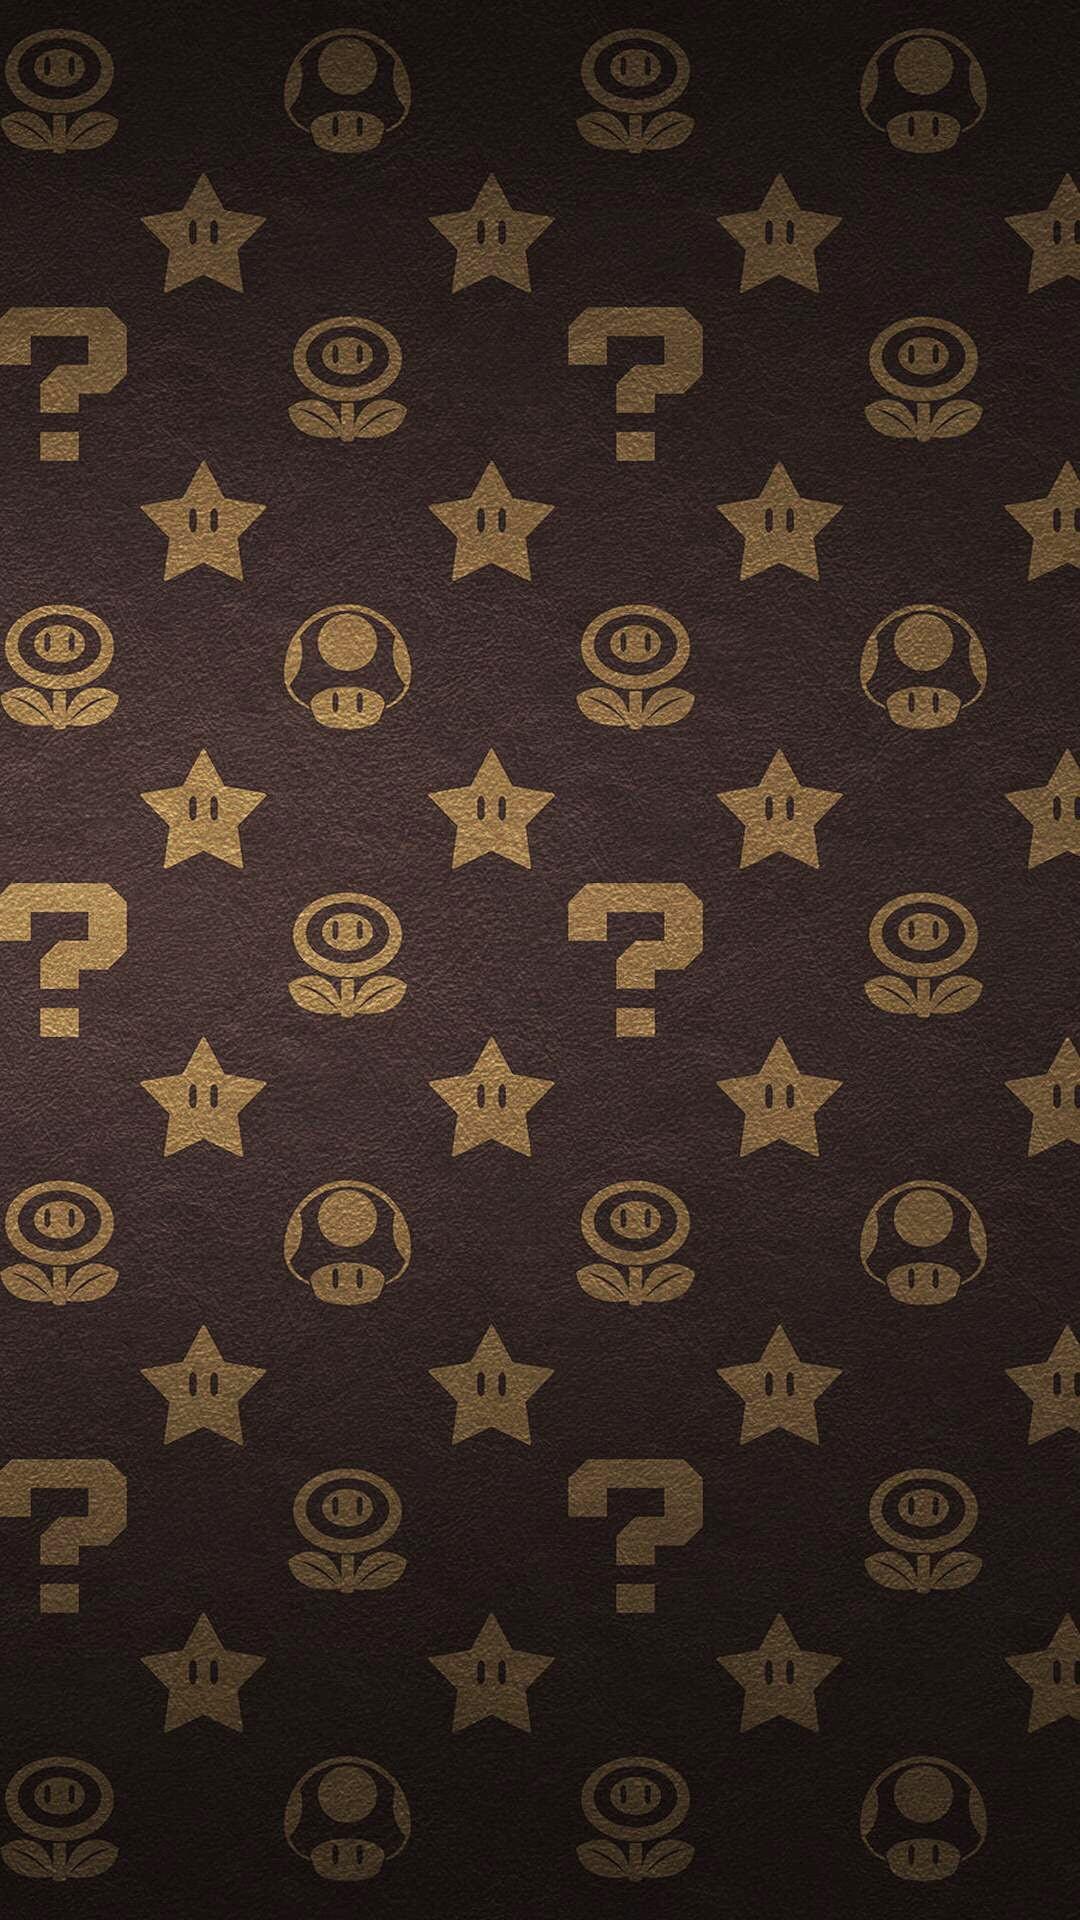 Super Mario brothers Louis Vuitton print pattern